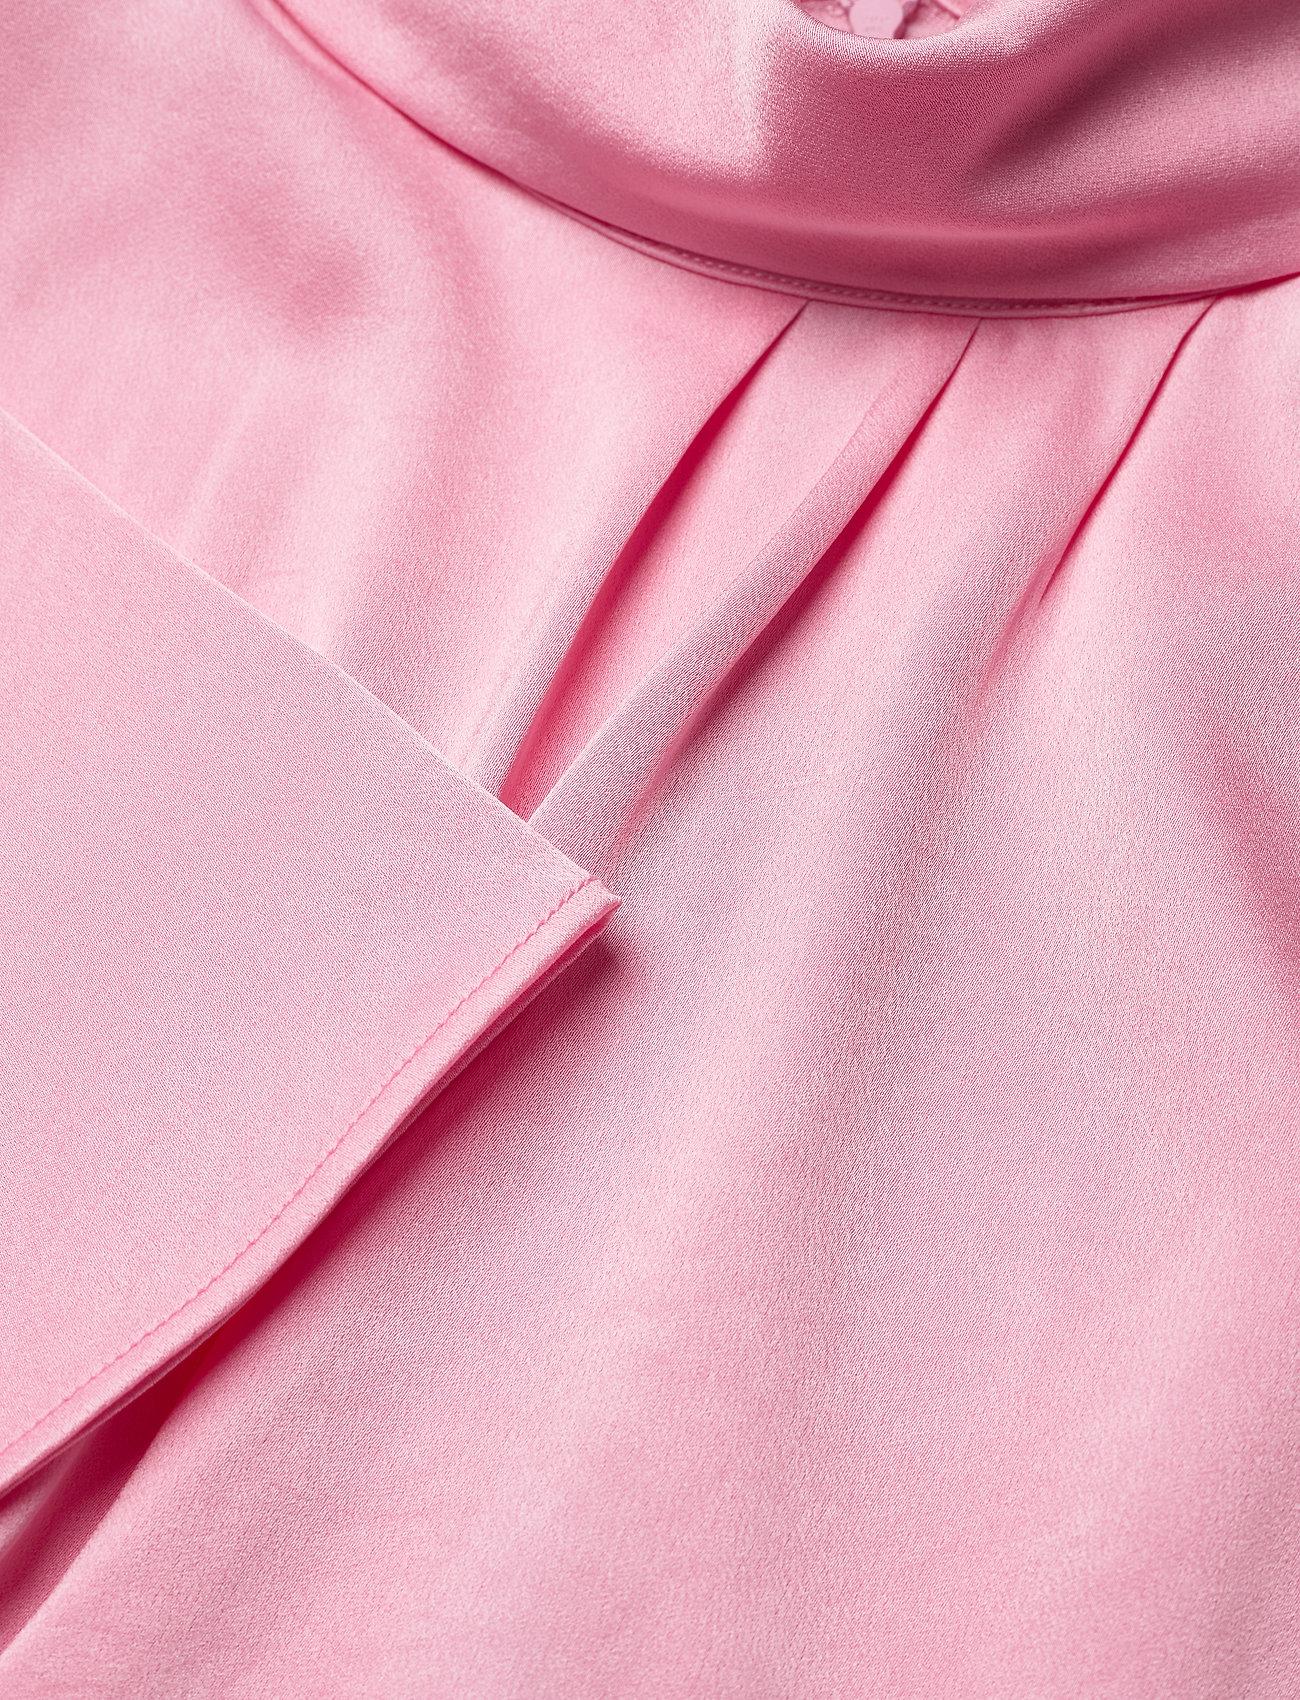 STINE GOYA - Arlinda, 1137 Sheen Cady - pink - 3